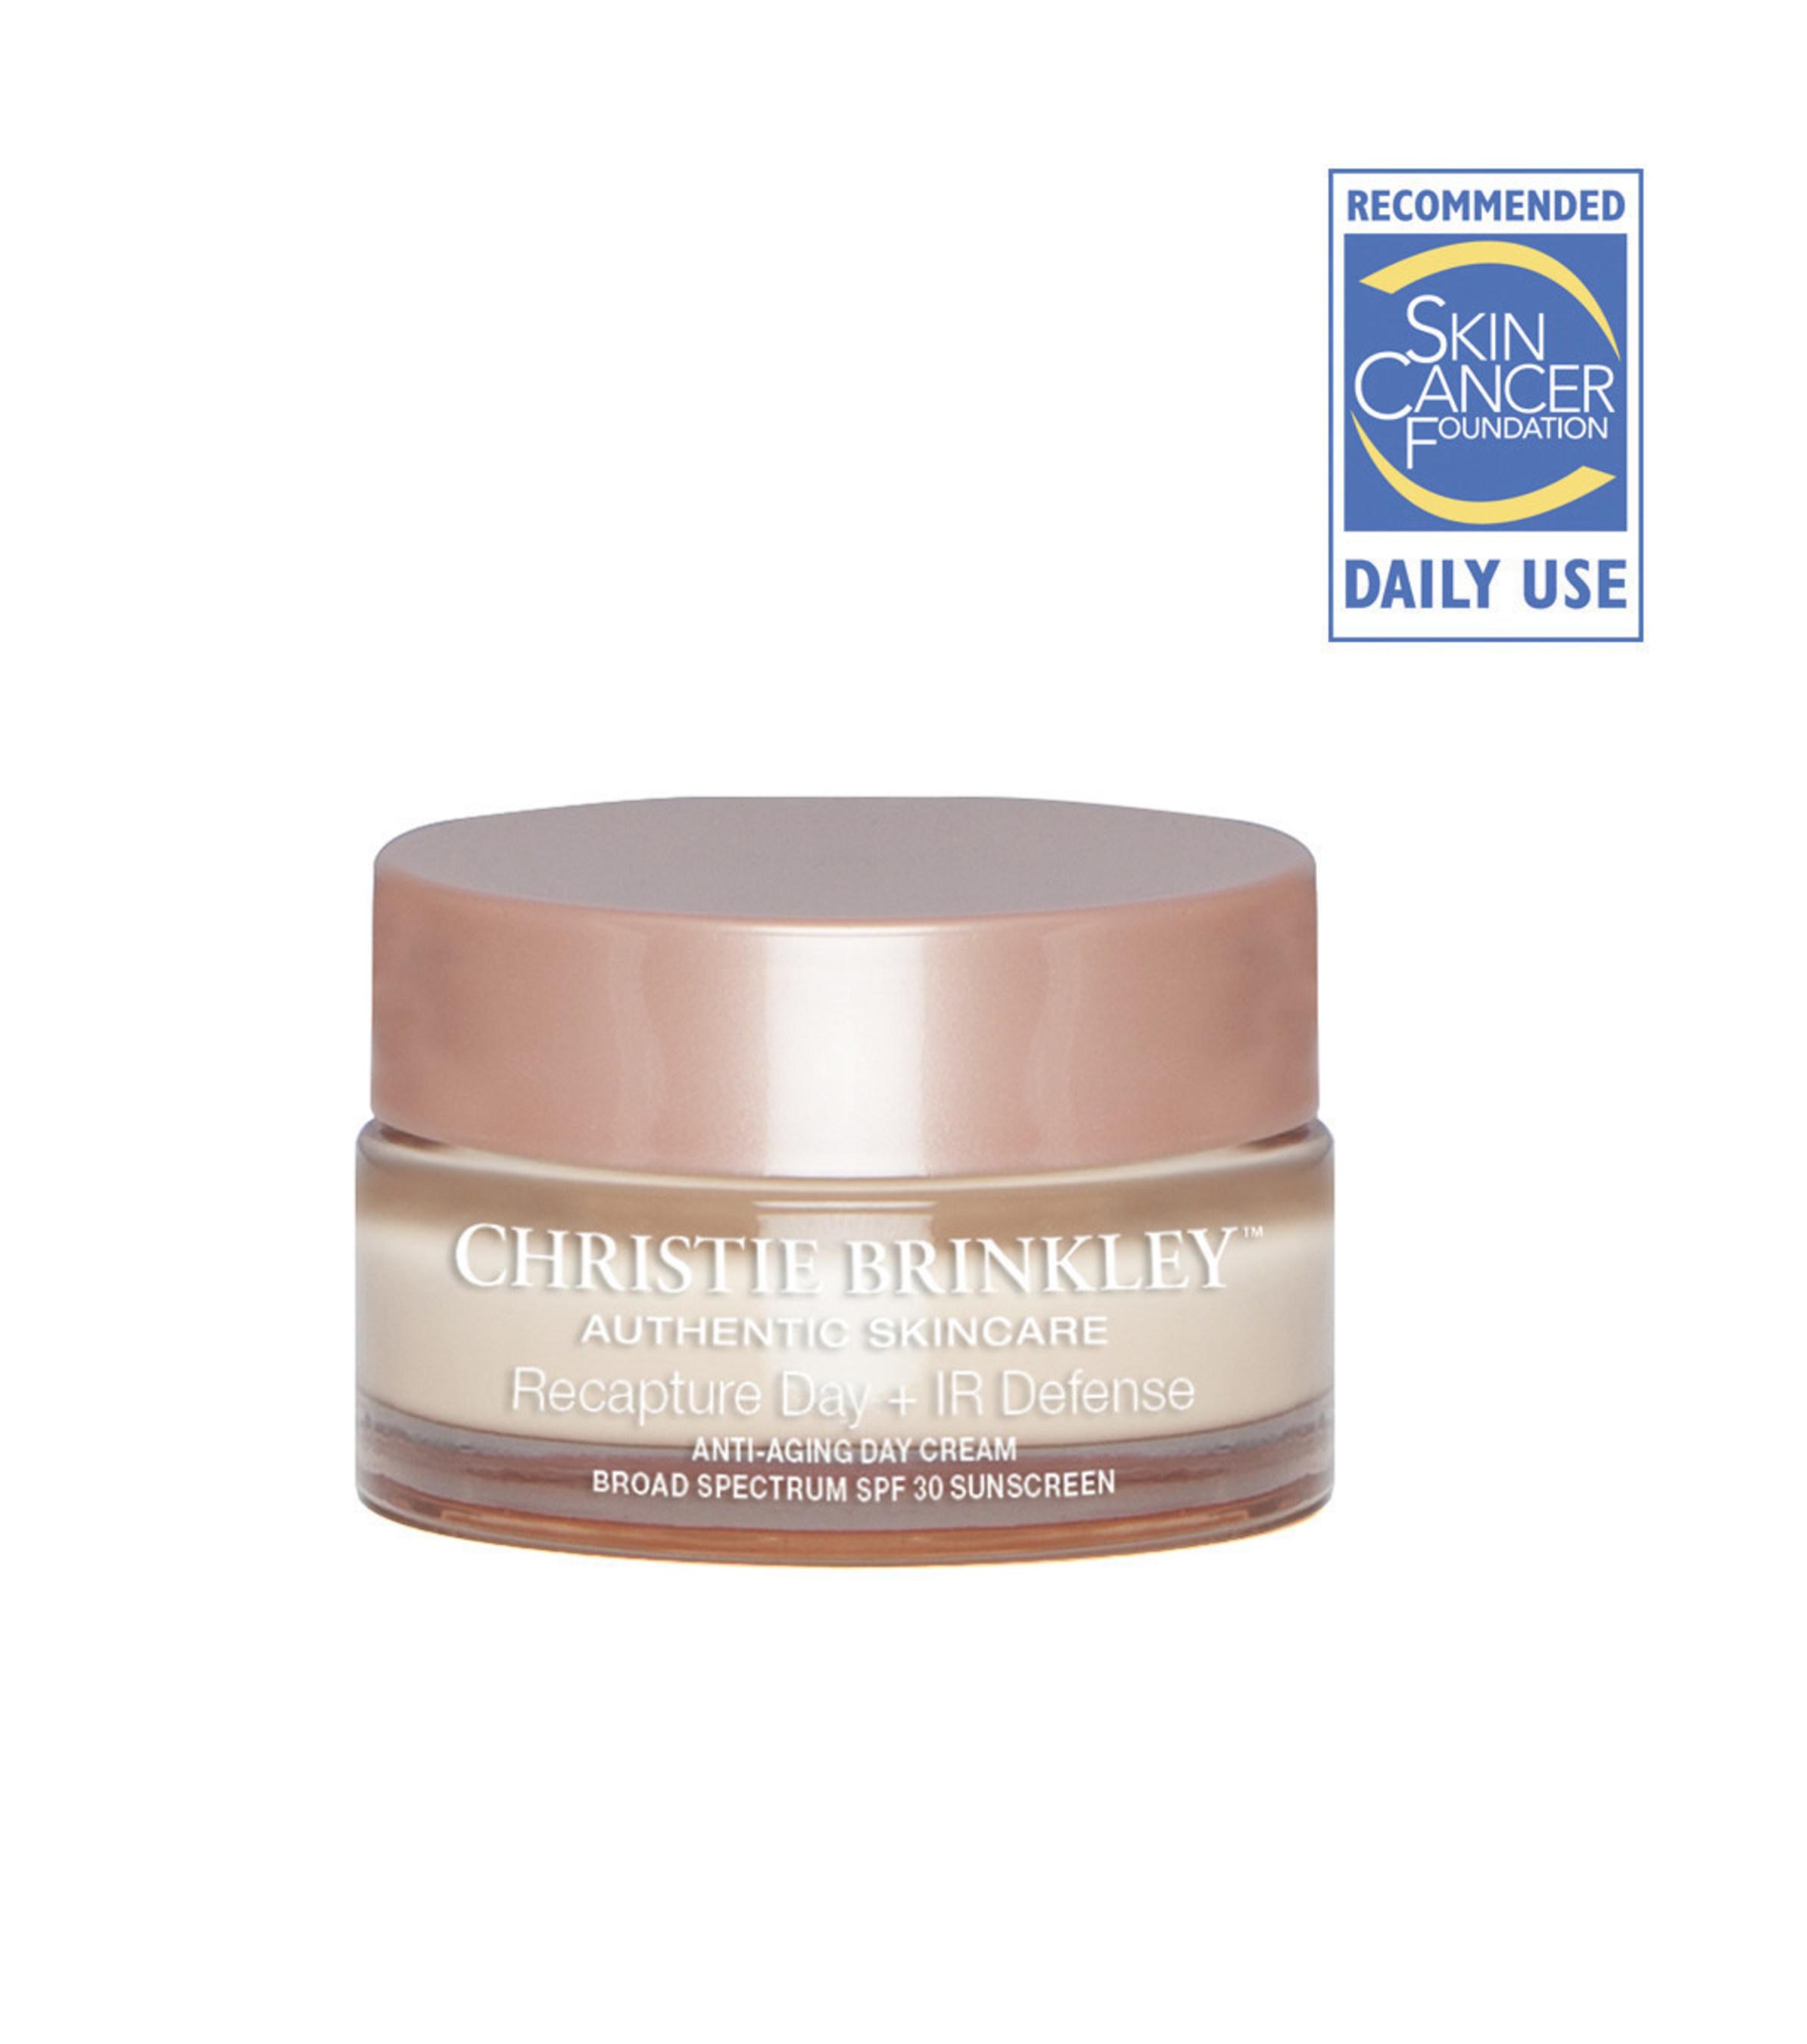 Christie Brinkley Authentic Skincare Recapture Day + IR Defense Anti-Aging Treatment